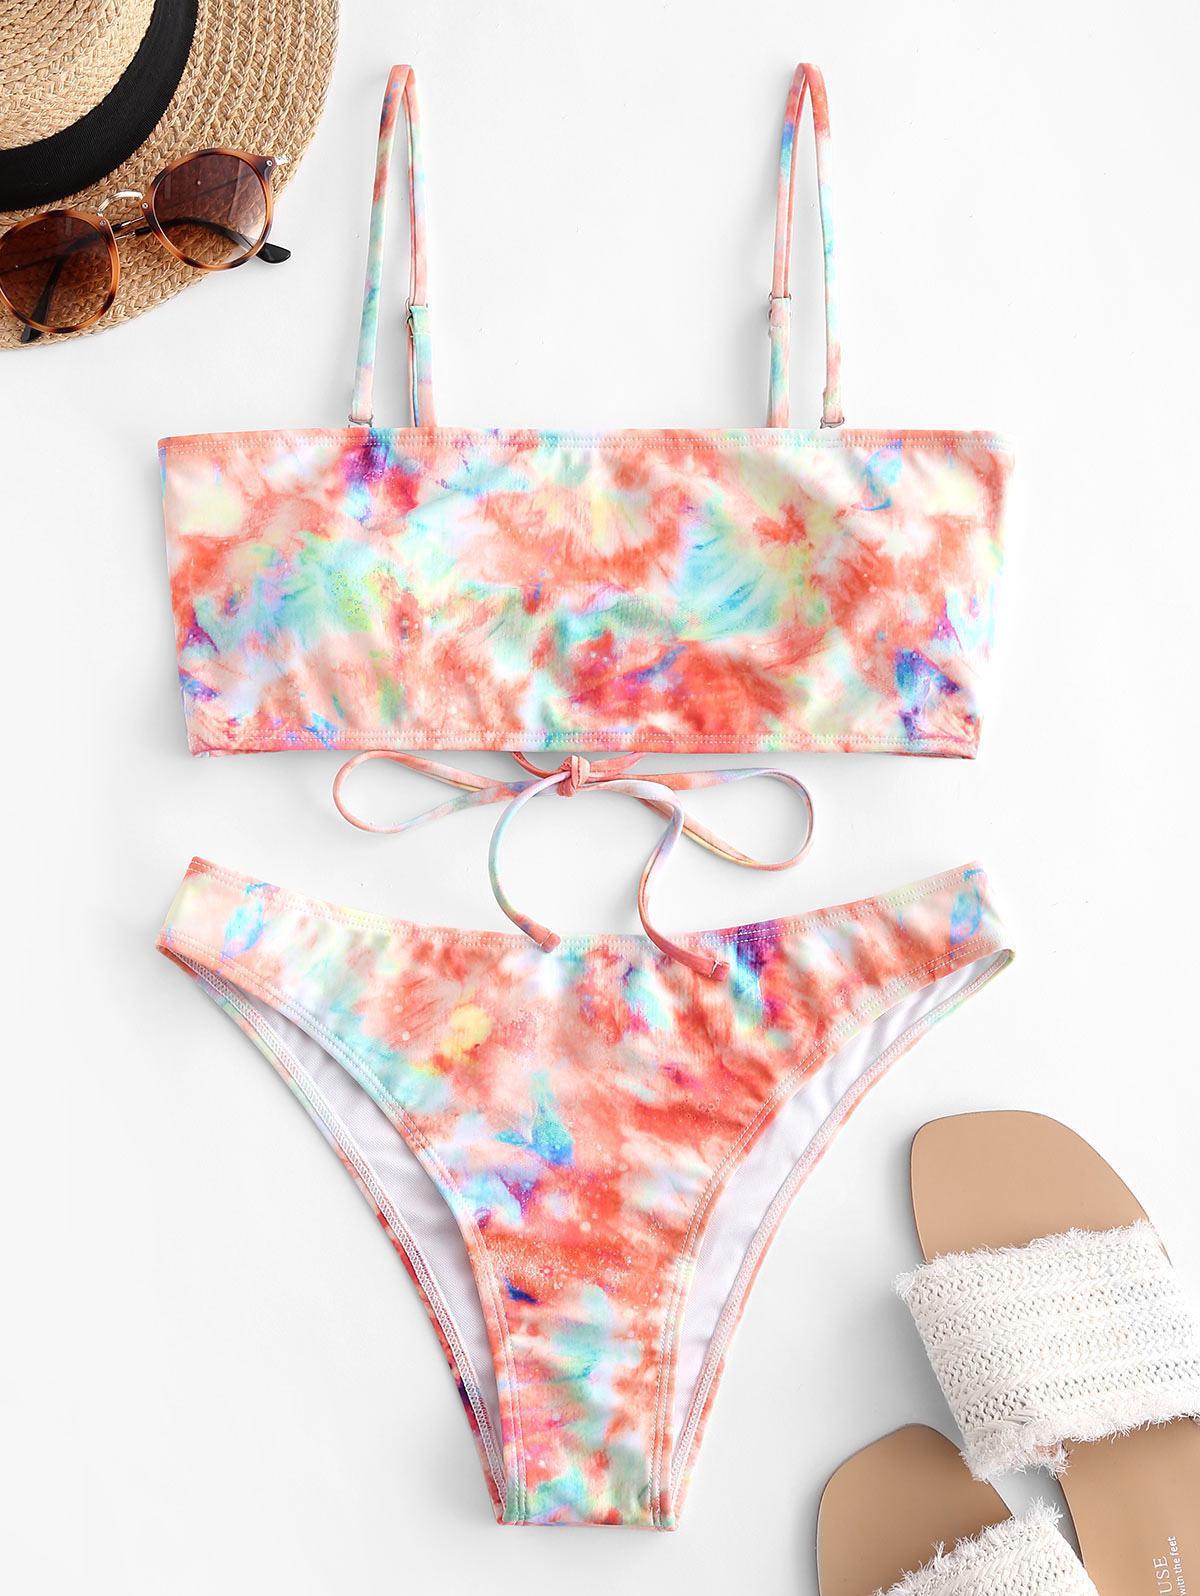 ZAFUL Tie Dye Lace Up Tube Bikini Swimwear thumbnail